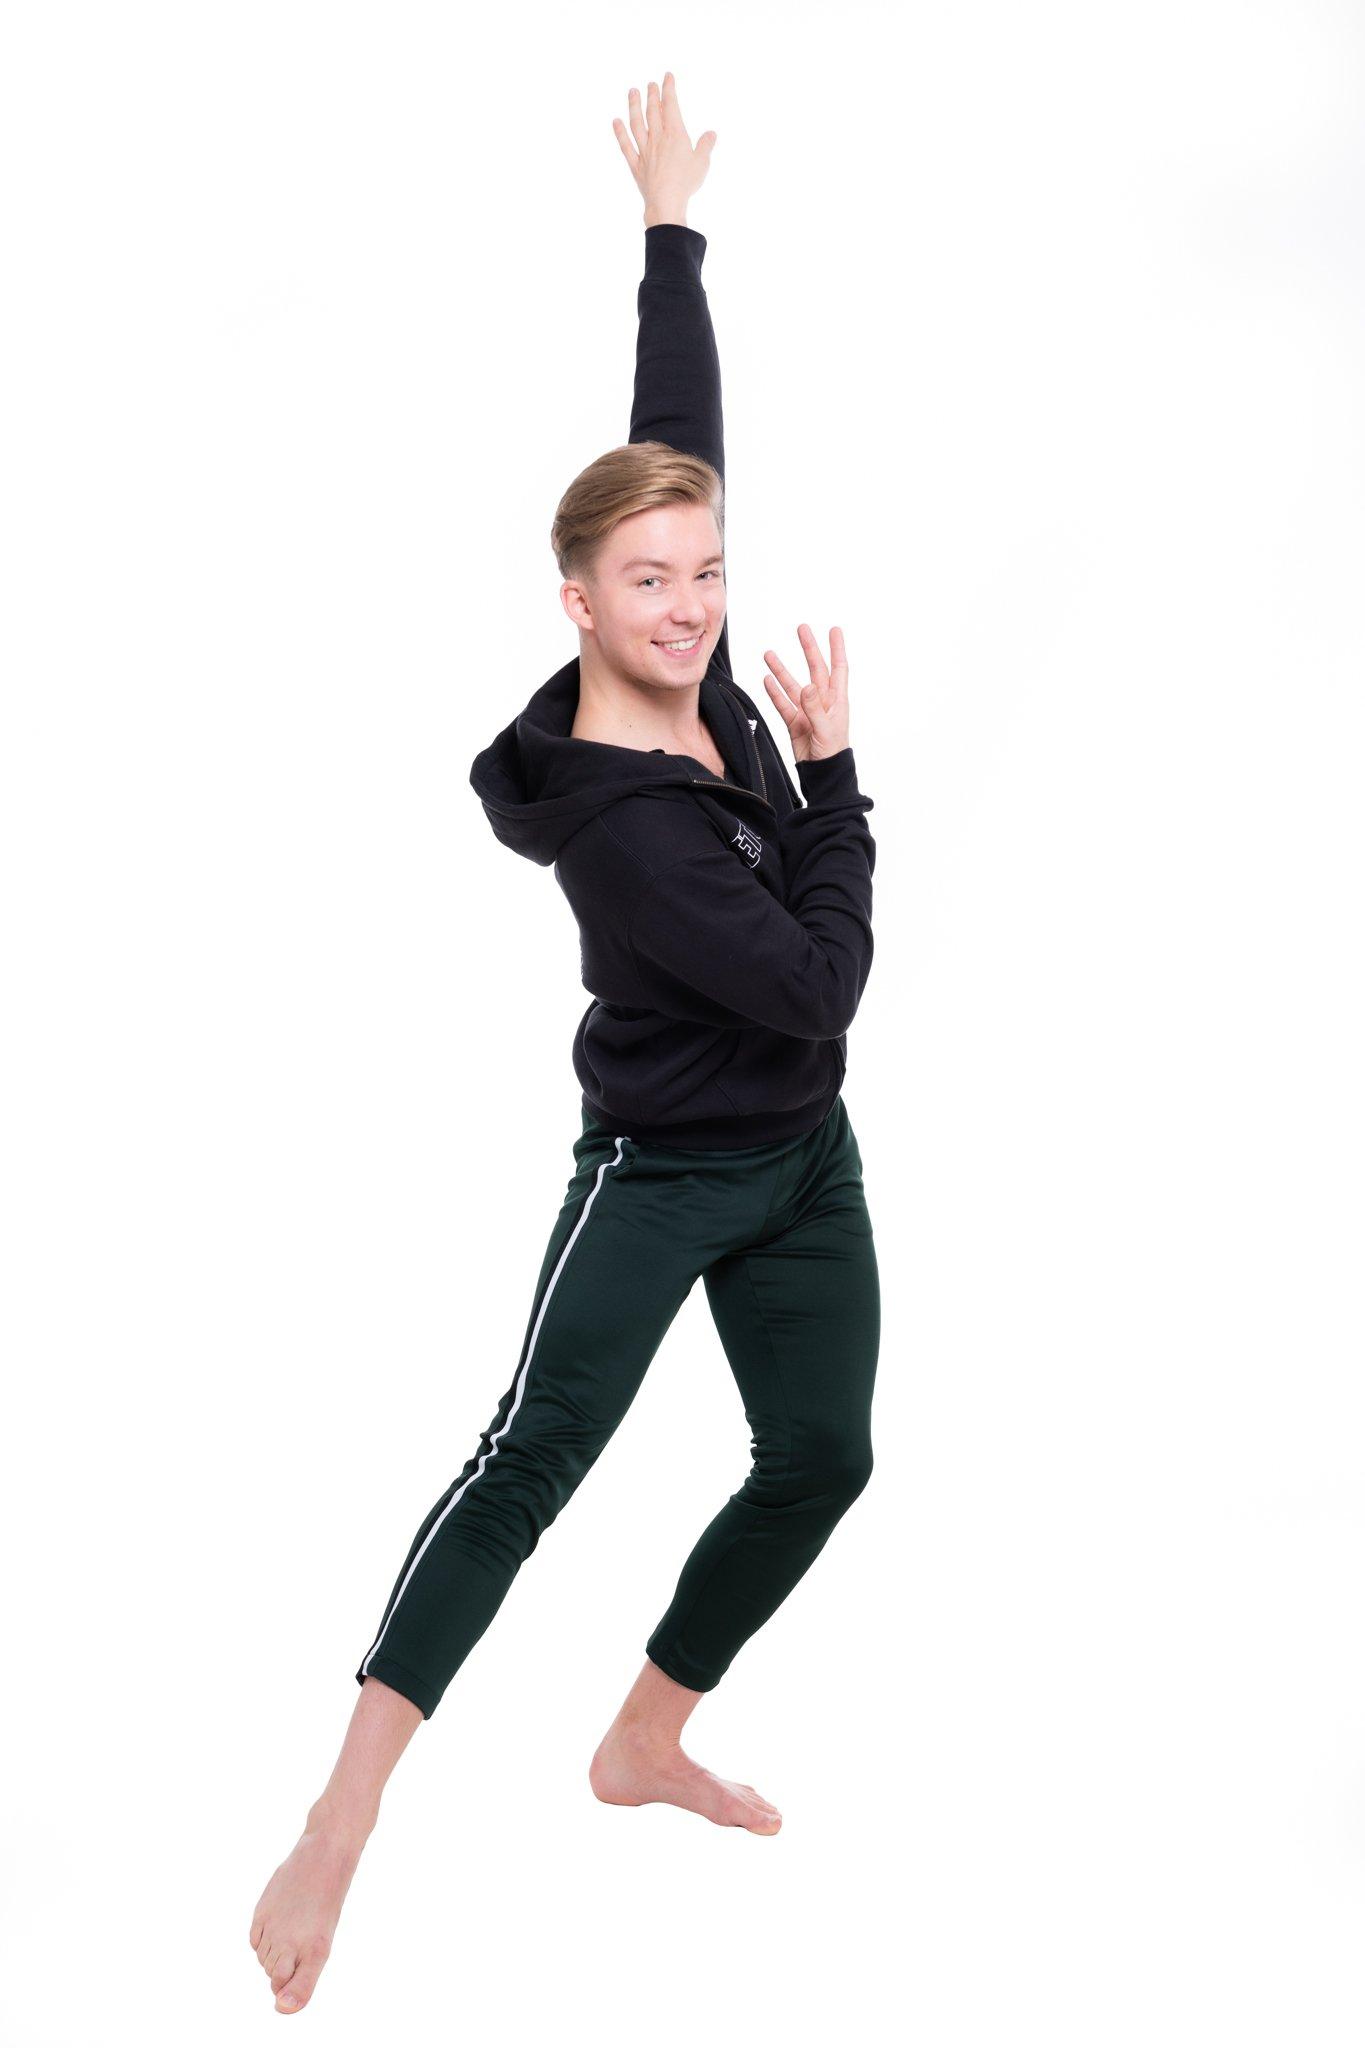 Keto Järvenpää